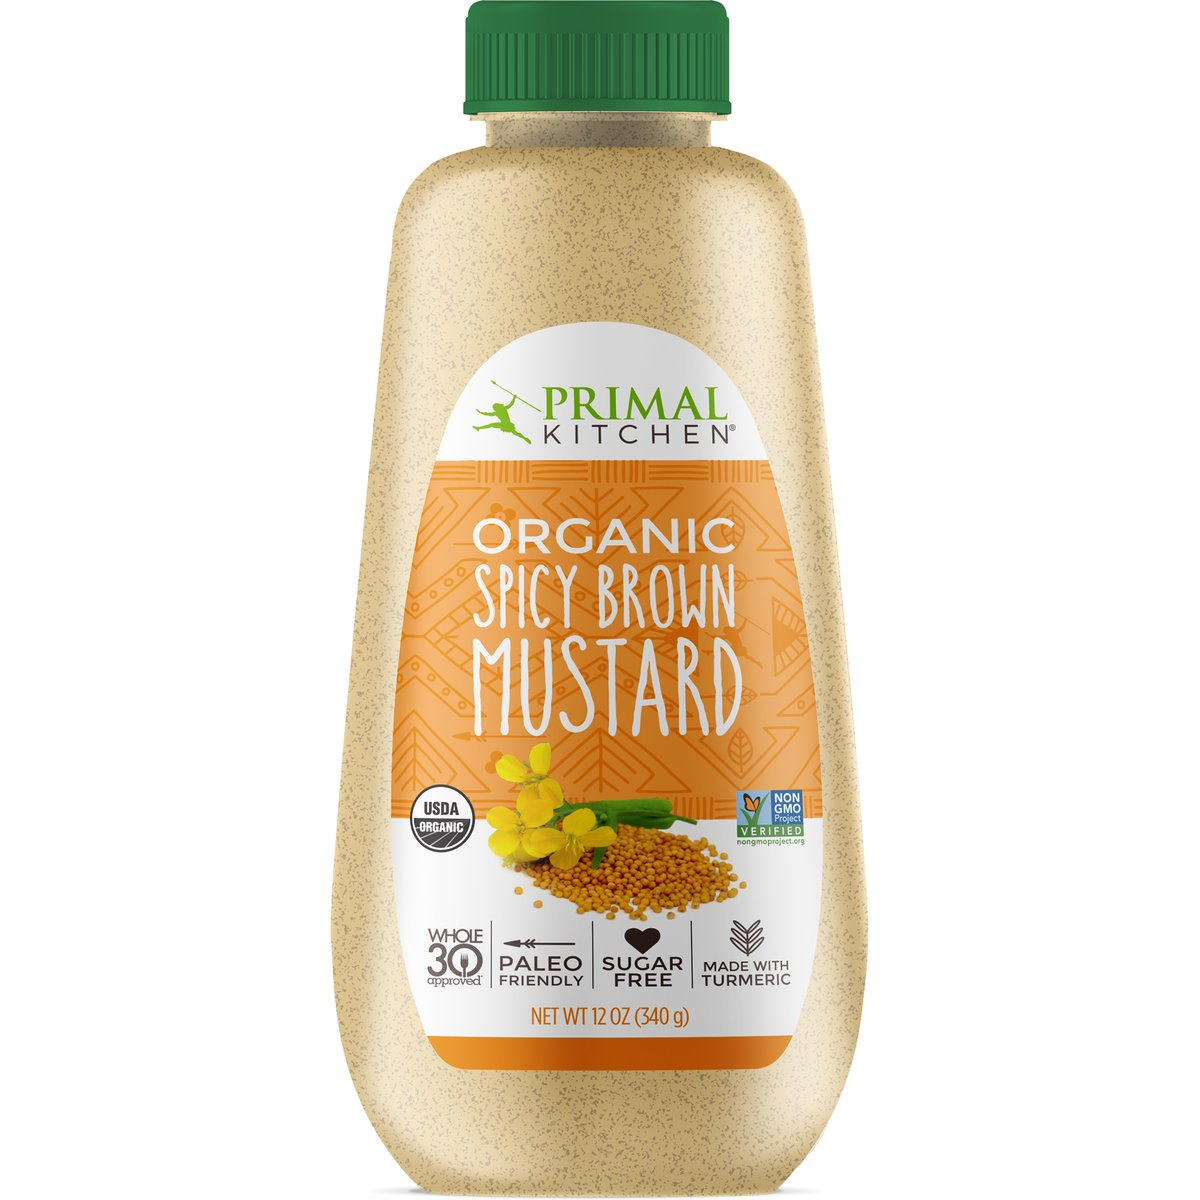 Organic Spicy Brown Mustard